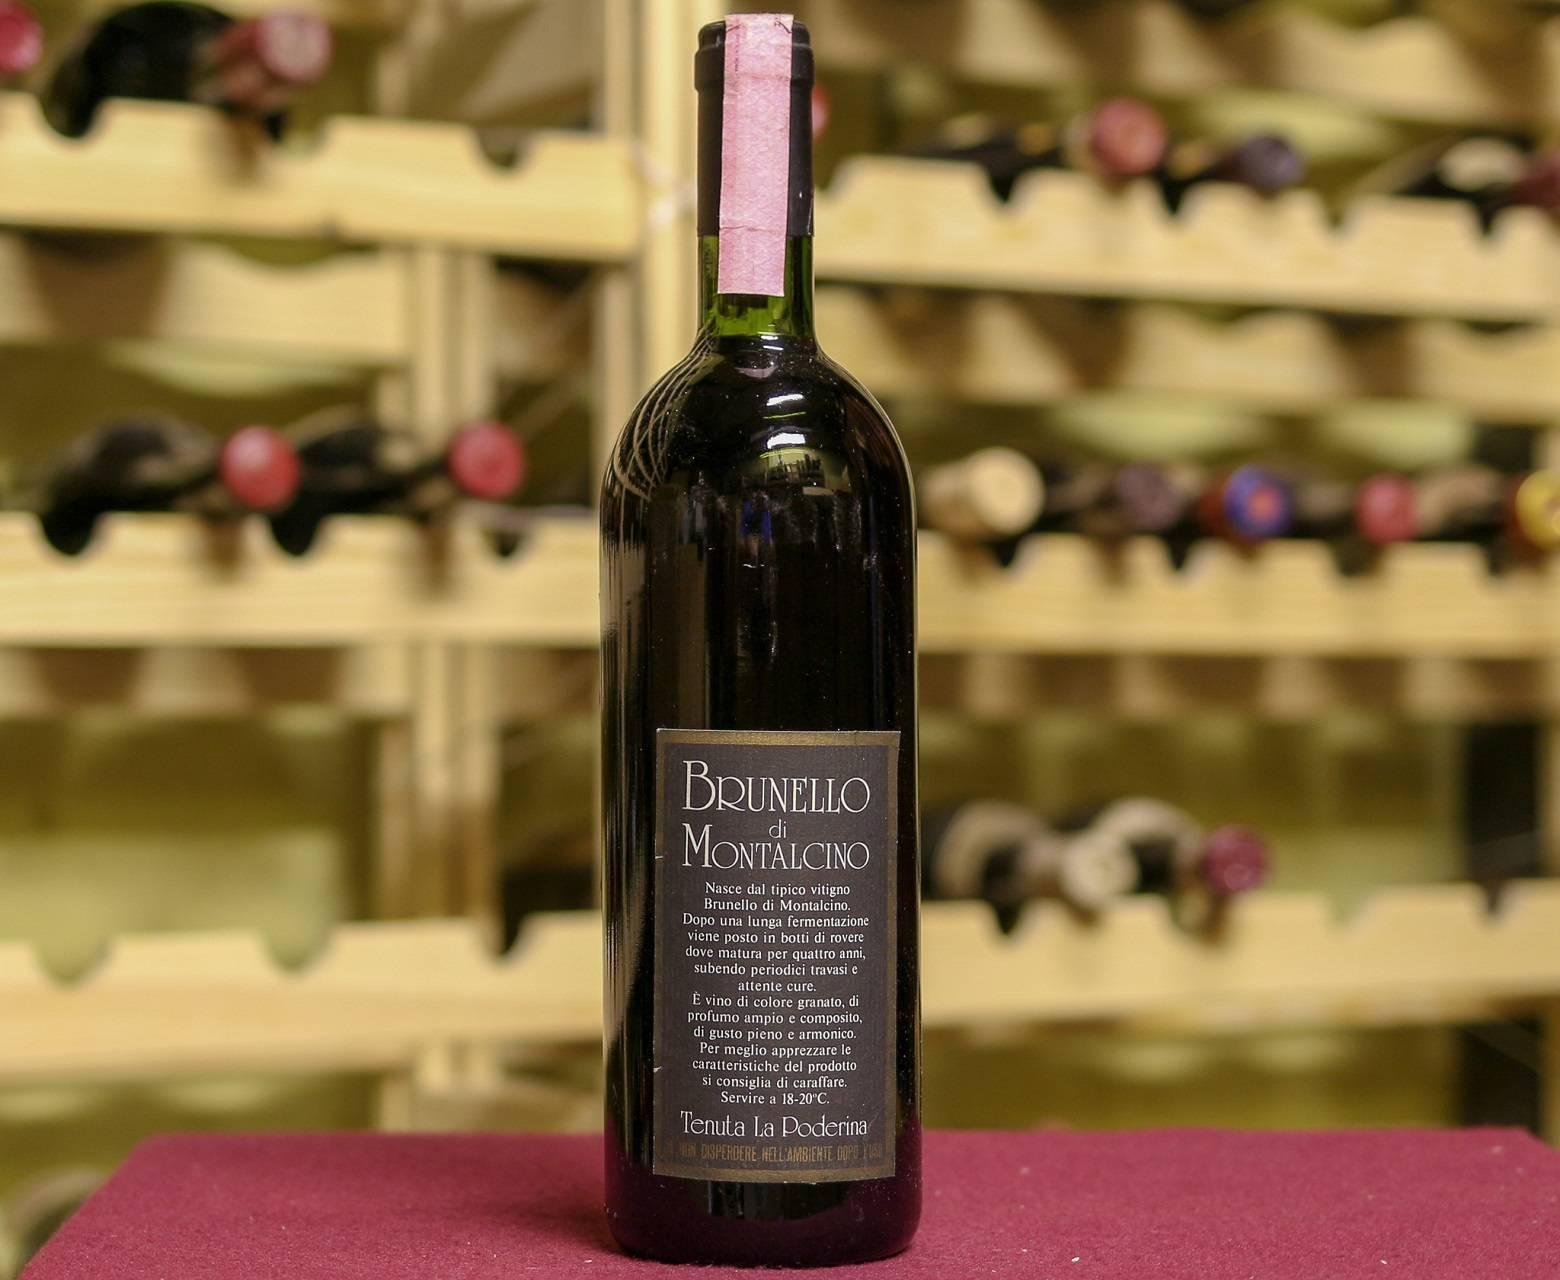 Вино брунелло ди монтальчино | дом в италии